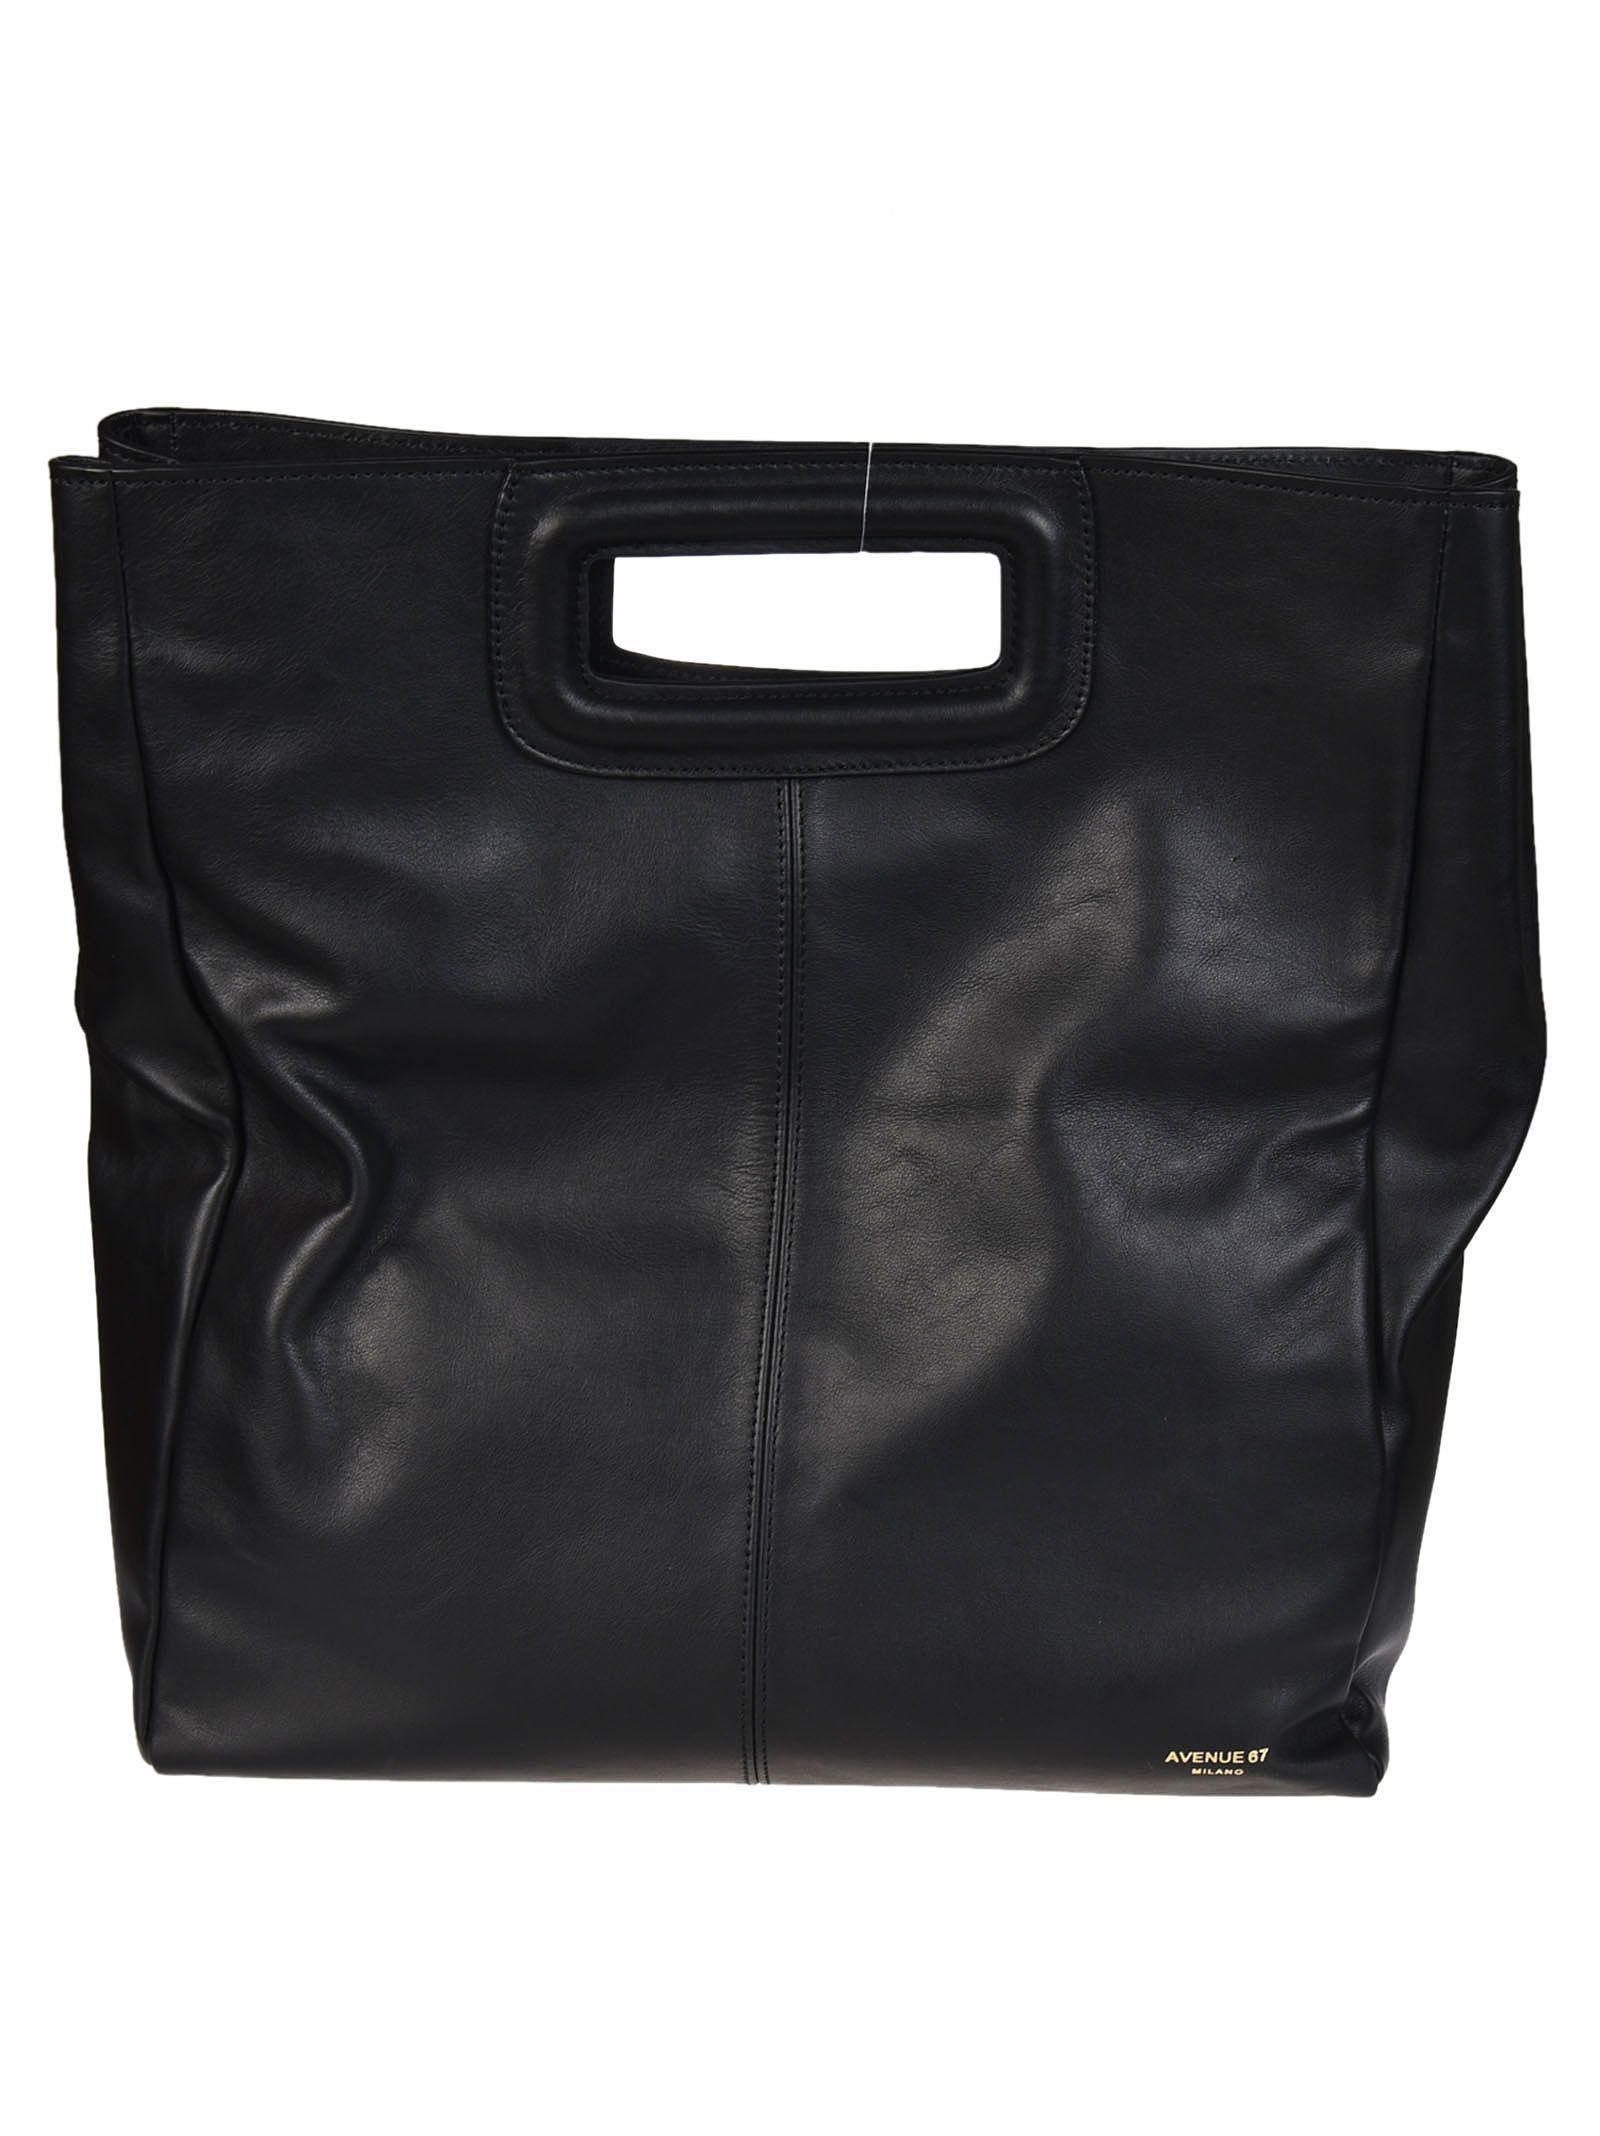 AVENUE 67 VEAL SKIN SHOPPER BAG.  avenue67  bags  hand bags ... 129ee1a8d82